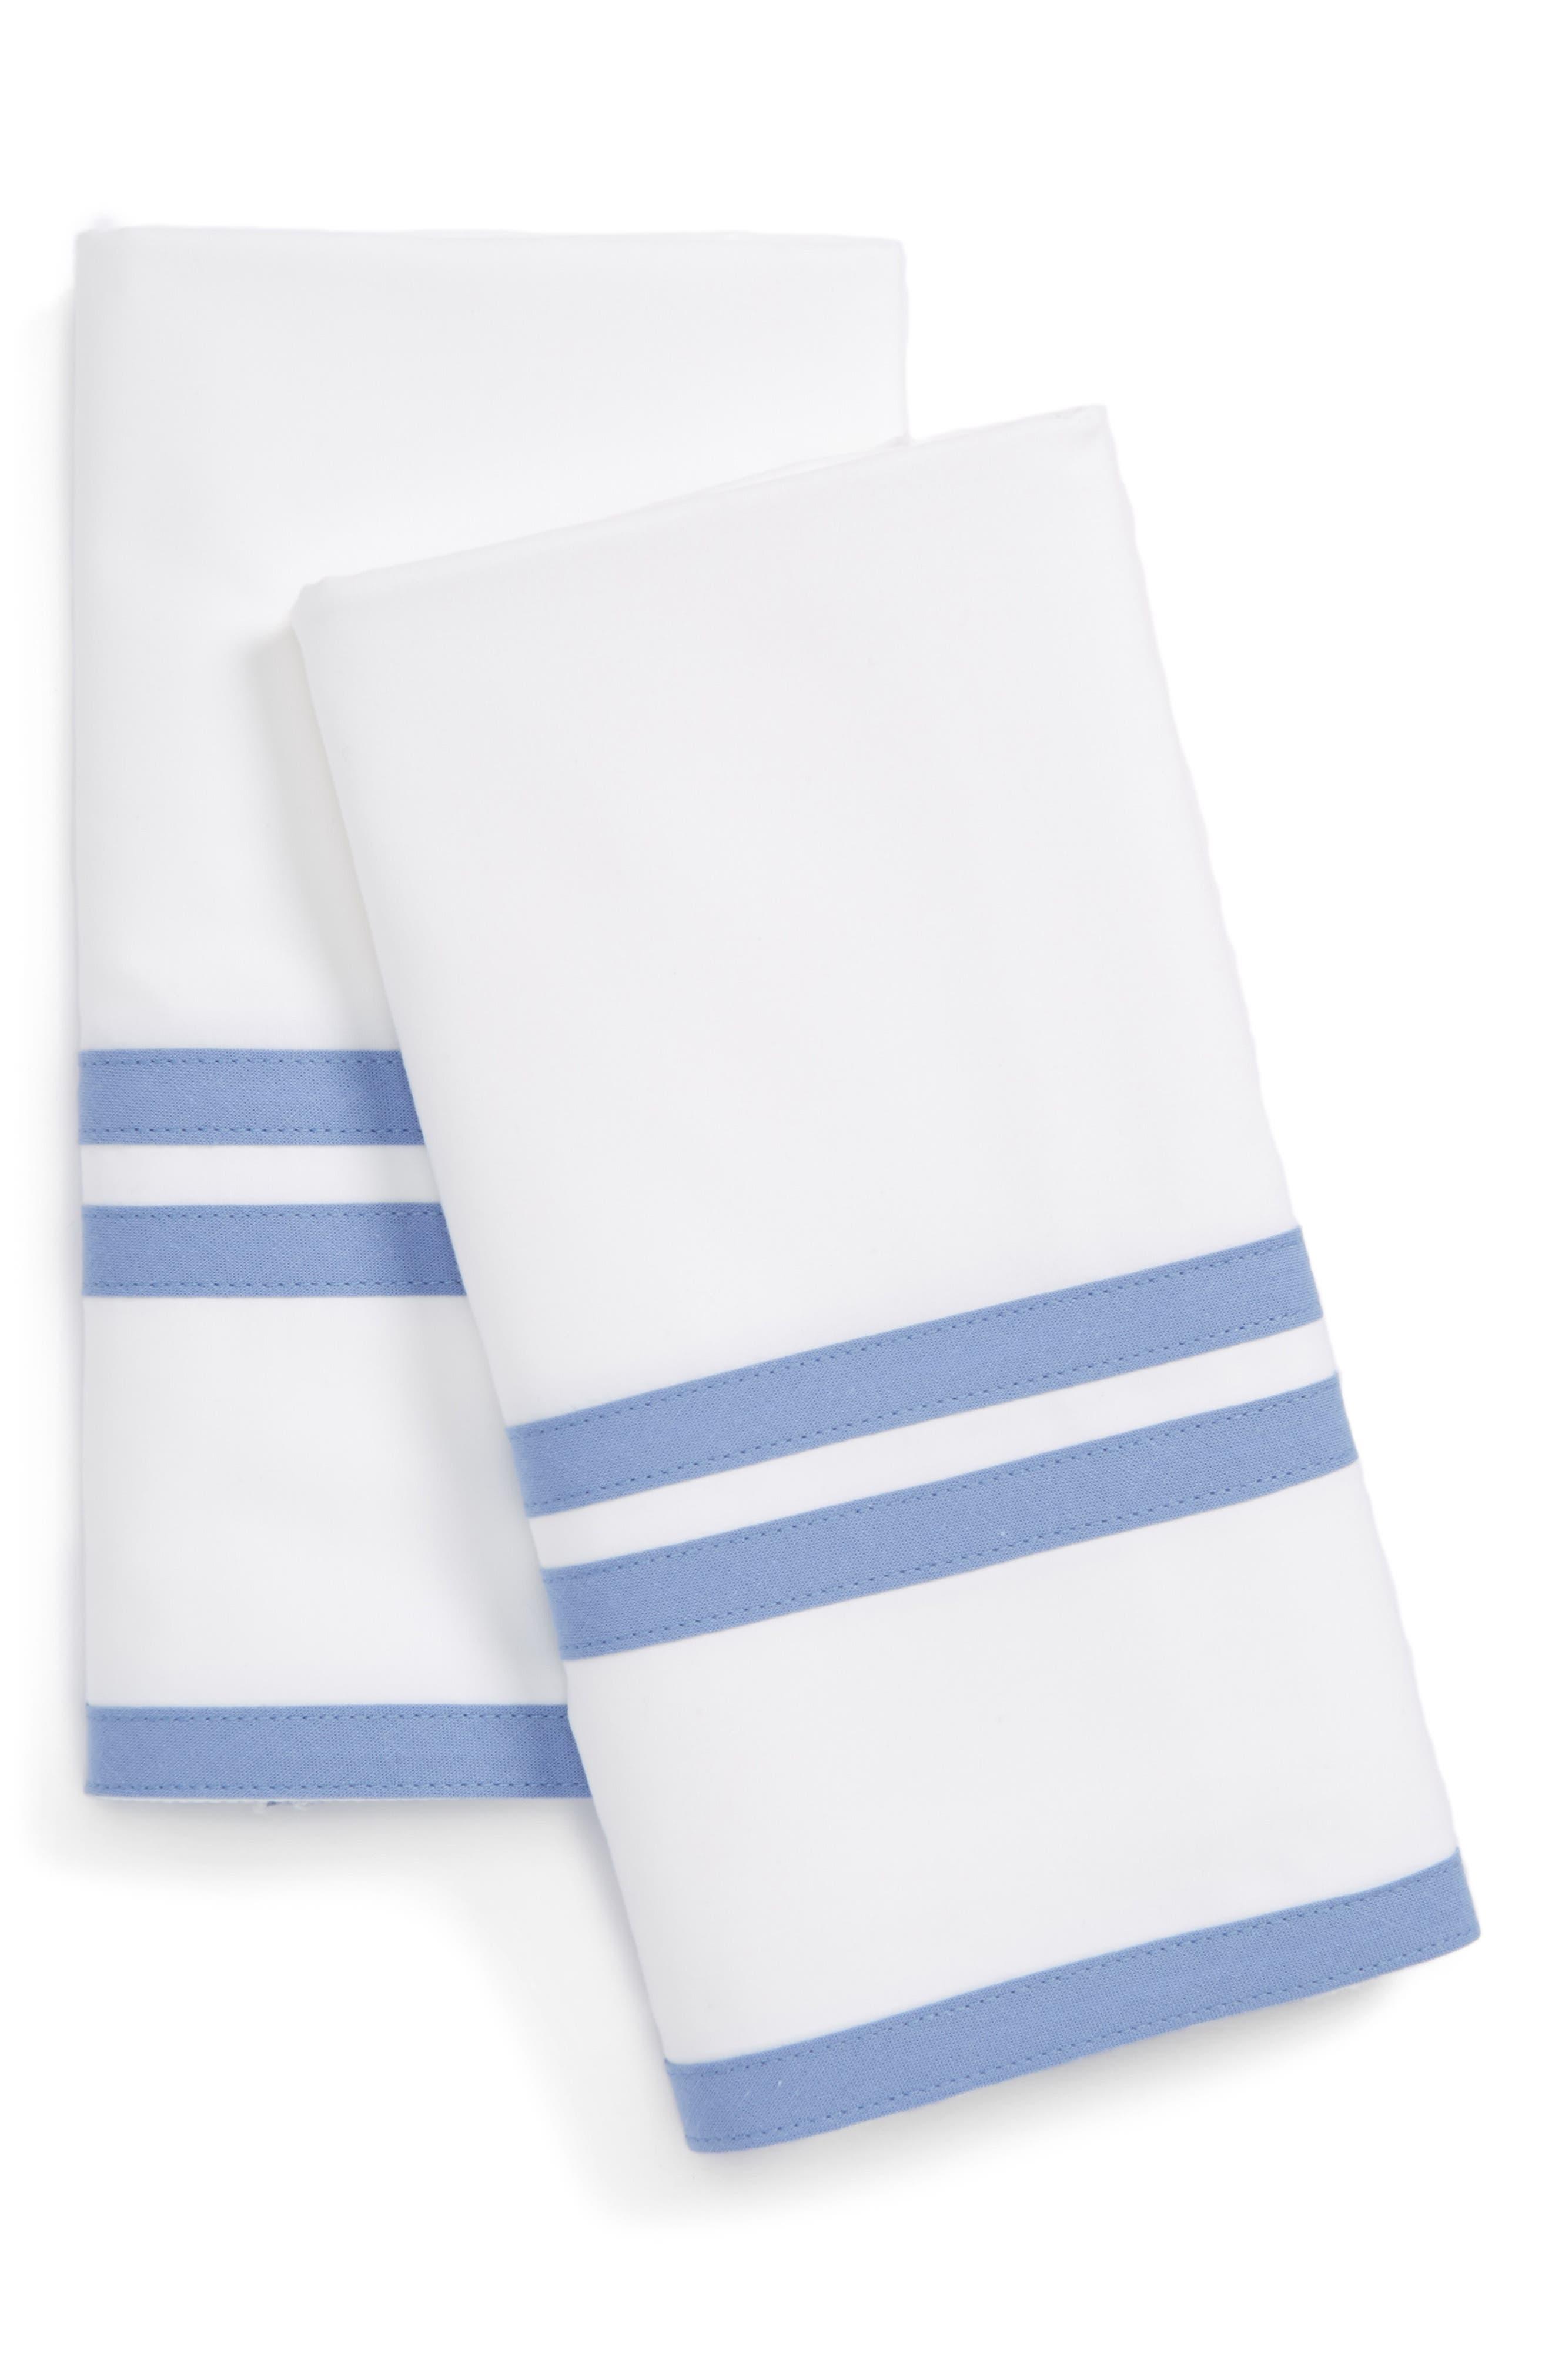 Main Image - Matouk Meridian Pillowcases